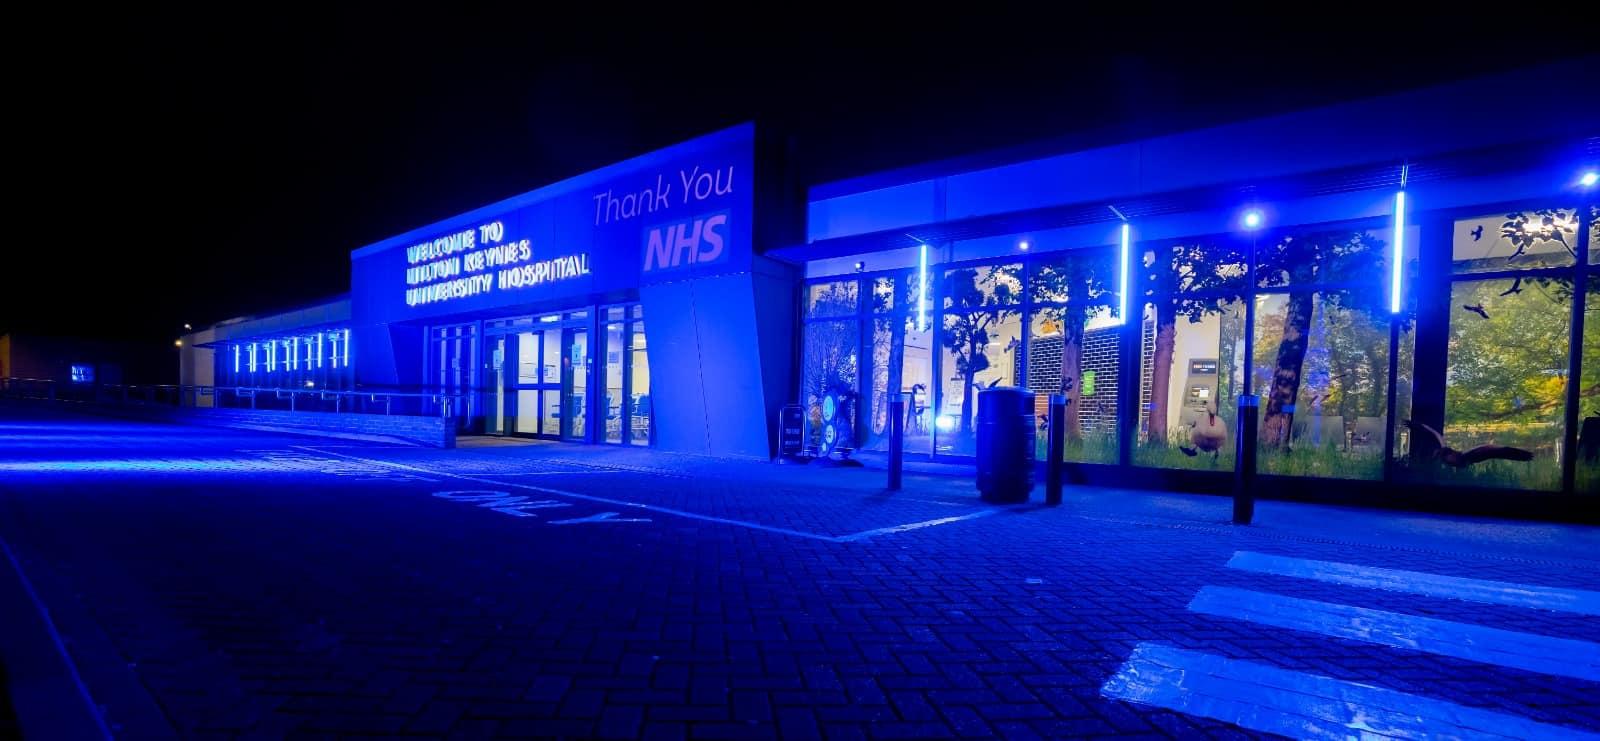 milton keynes university hospital lighting